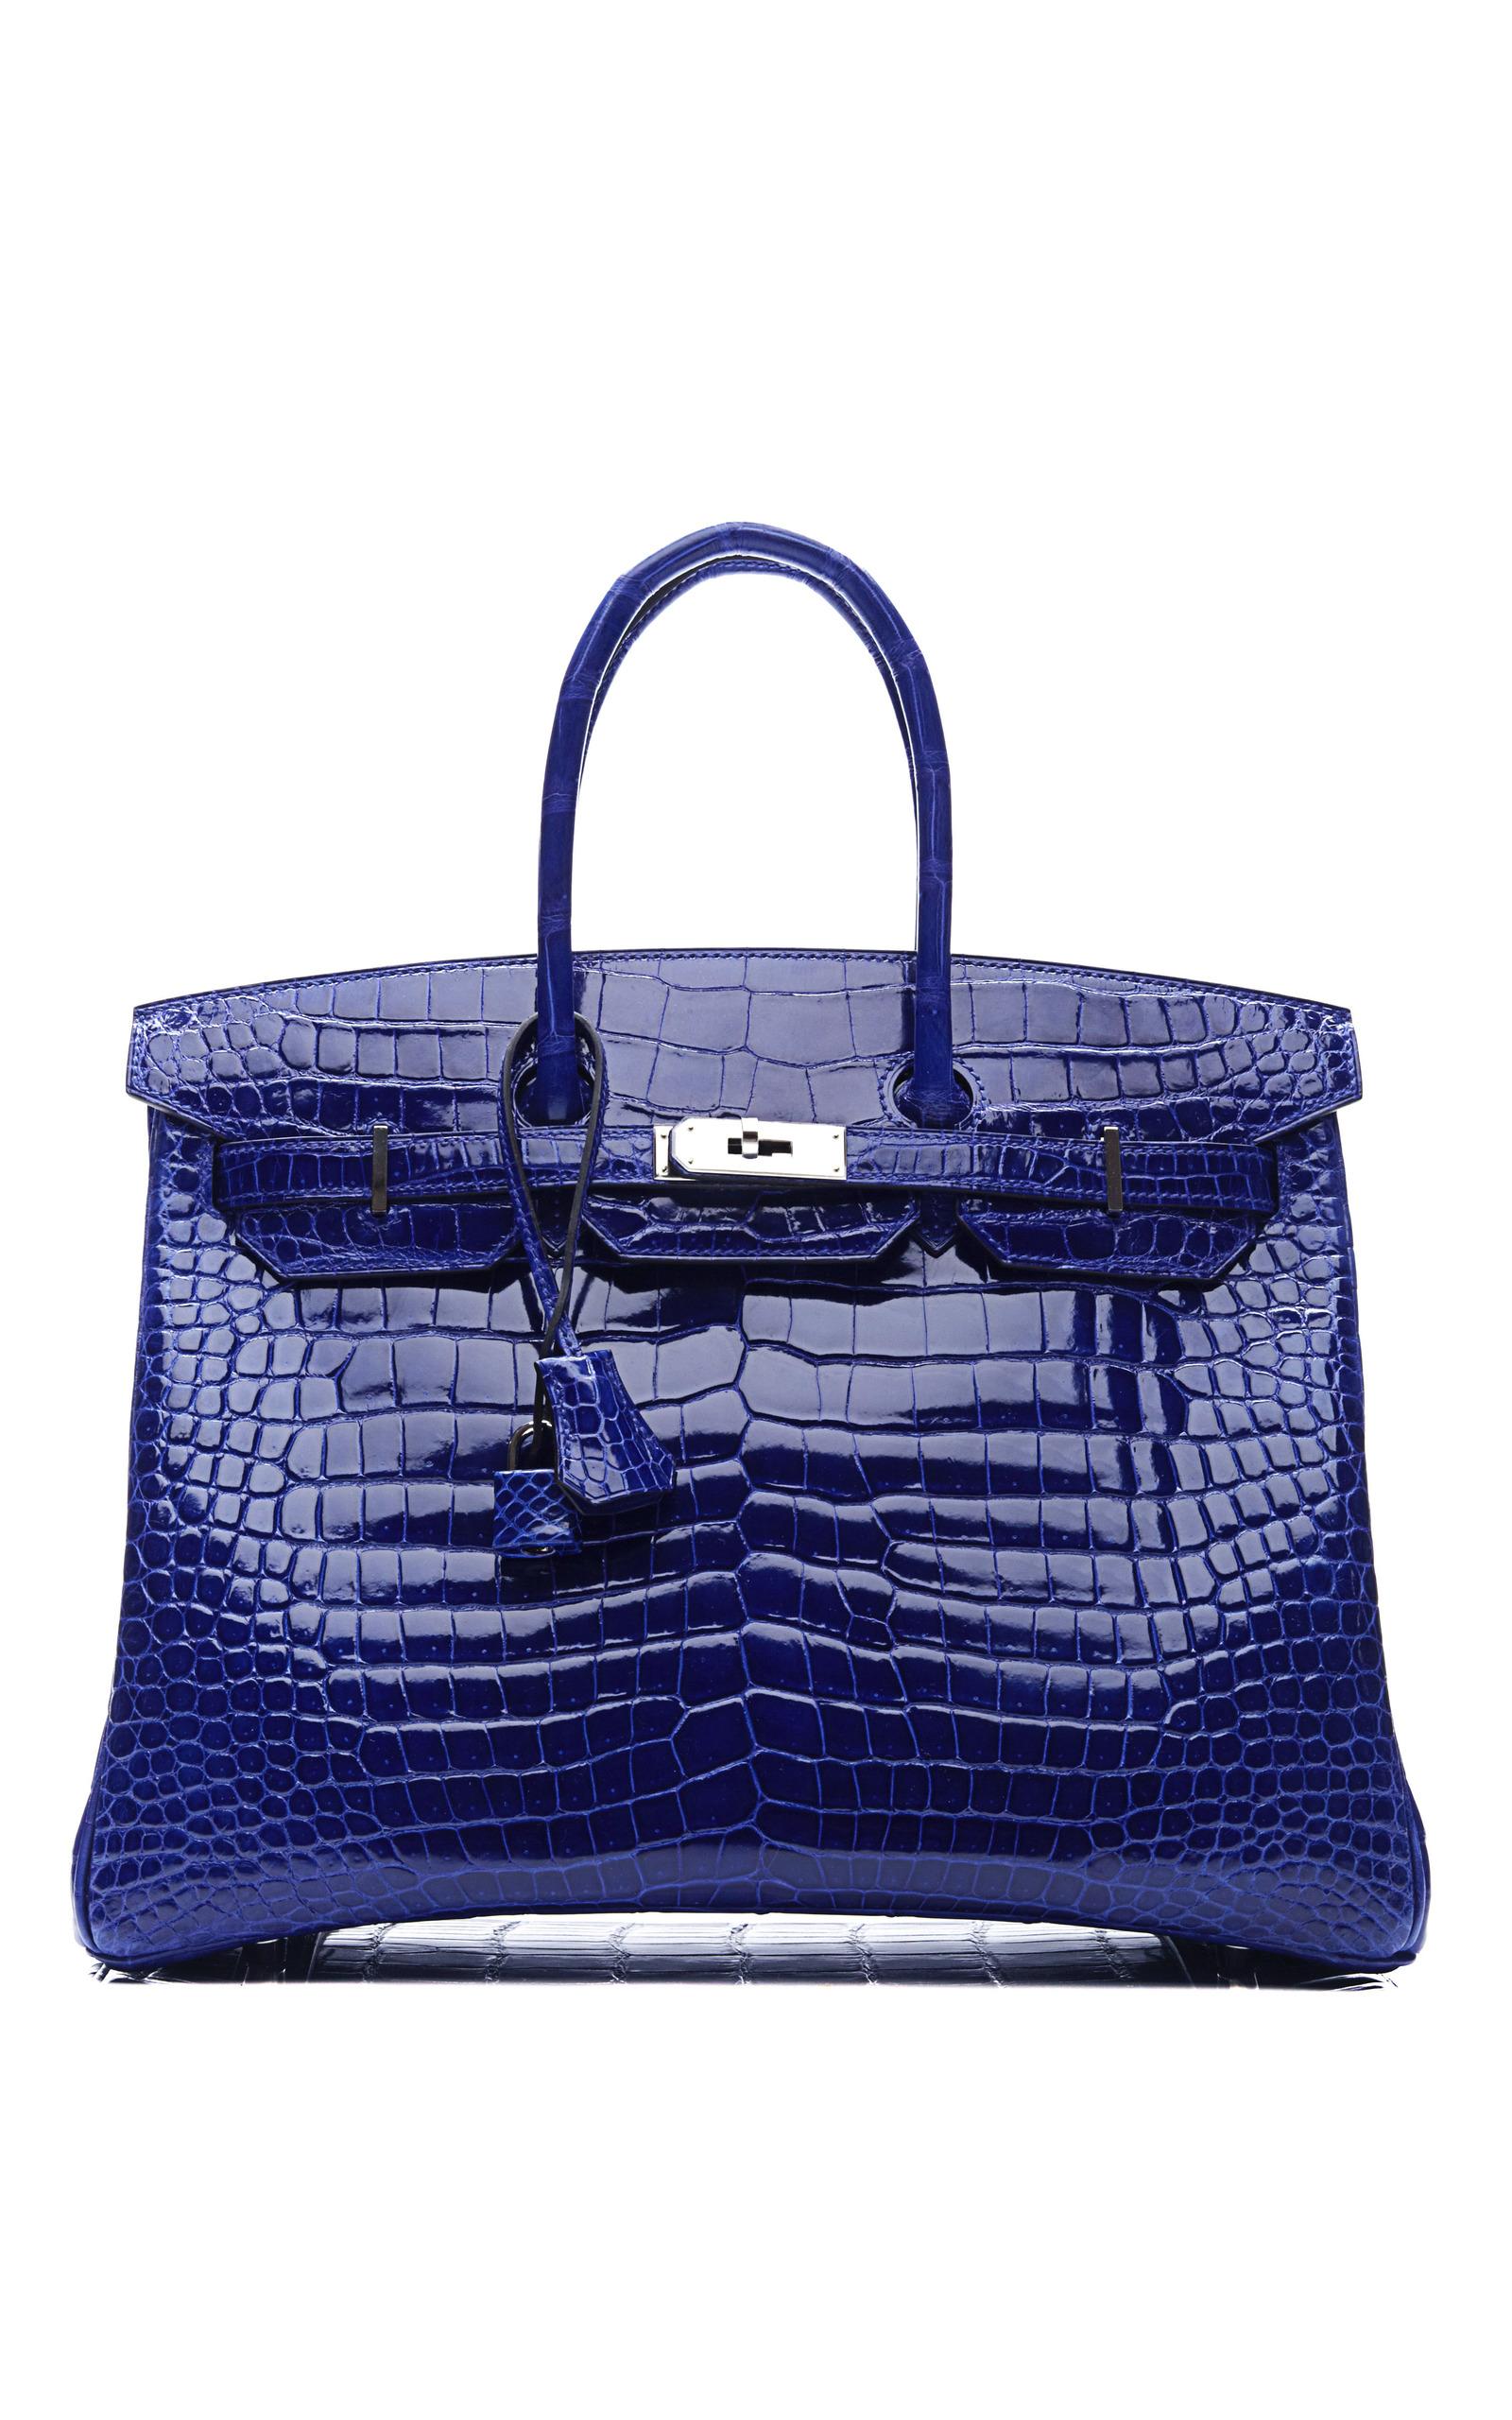 e818eecc127 Hermes Vintage35Cm Shiny Electric Blue Porosus Crocodile Birkin. CLOSE.  Loading